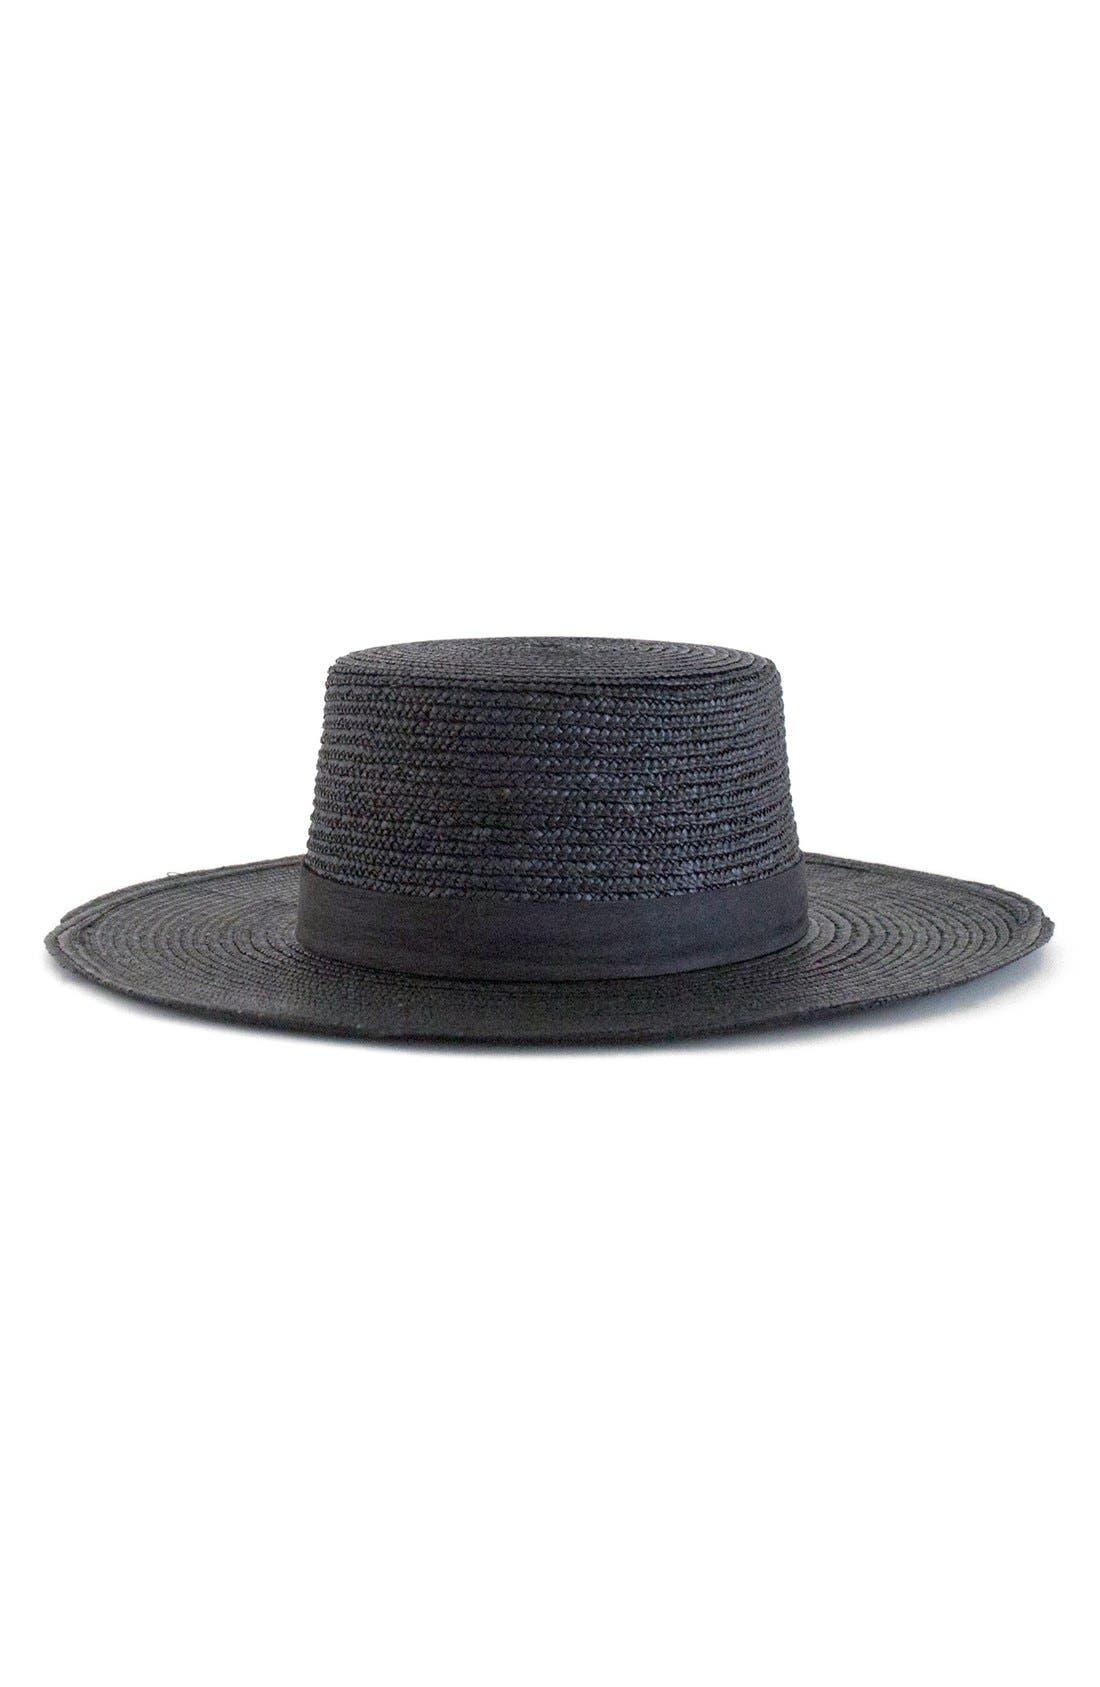 'Calla' Straw Bolero Hat,                             Main thumbnail 1, color,                             001